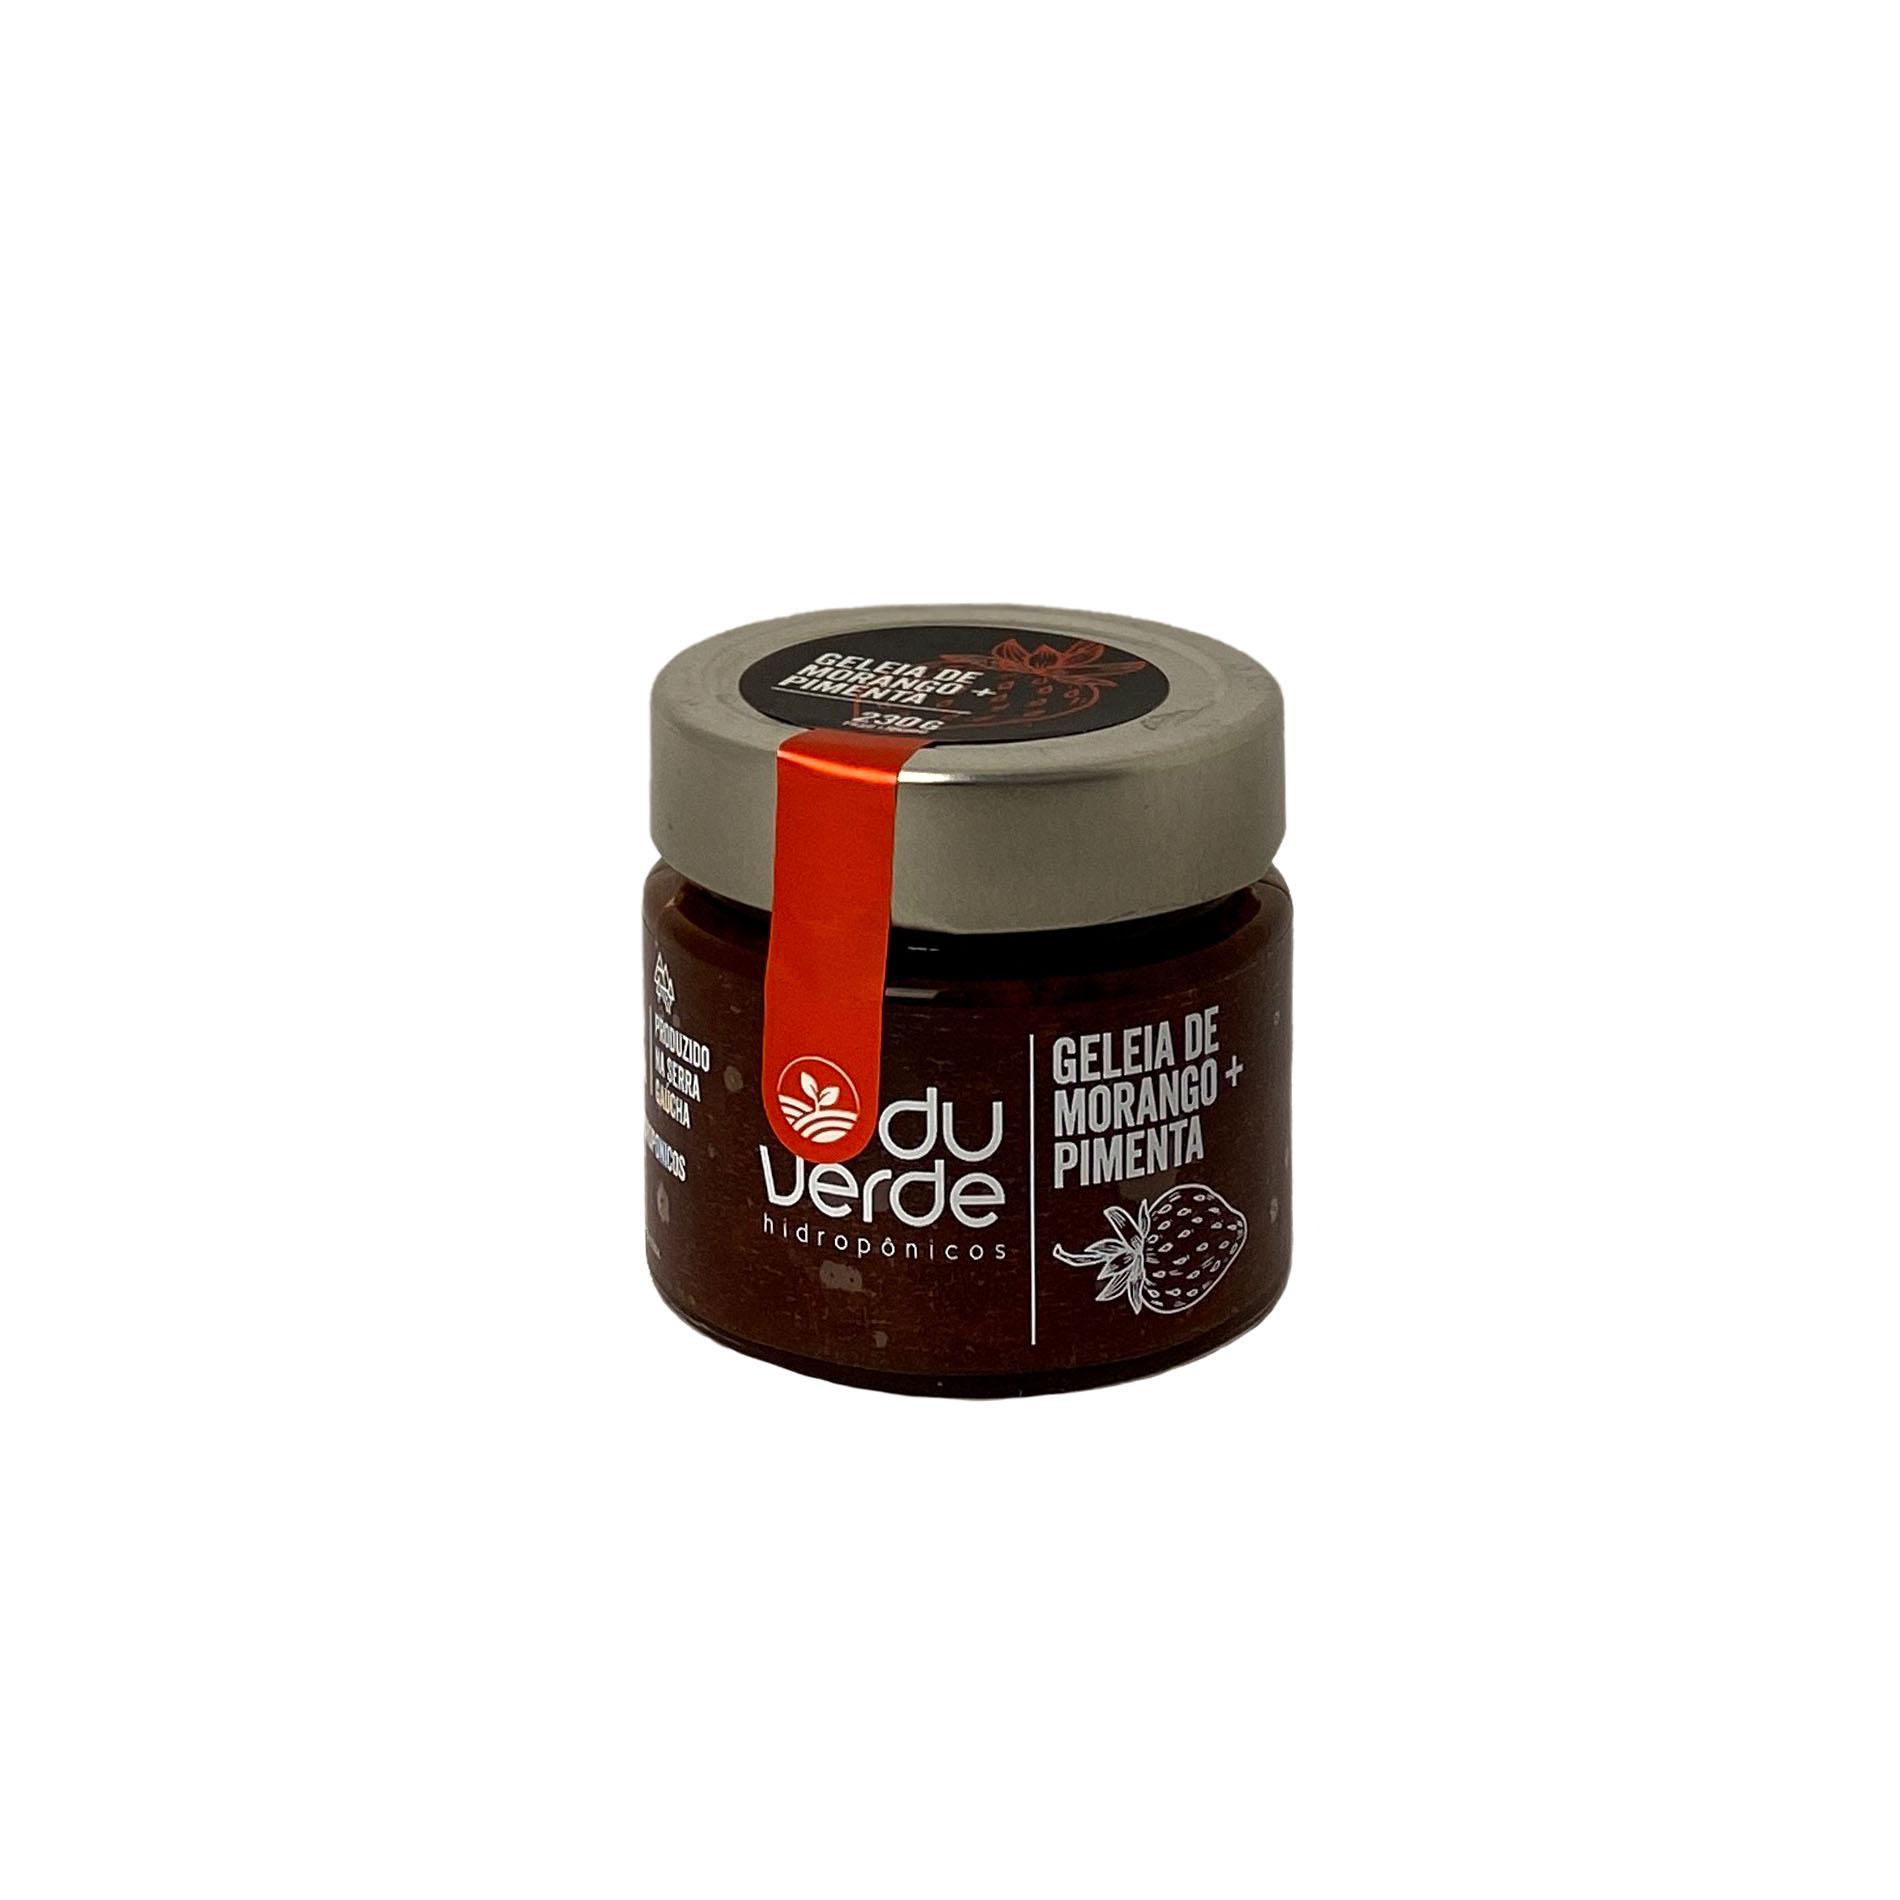 Geleia de Morango + Pimenta  - Vinerize